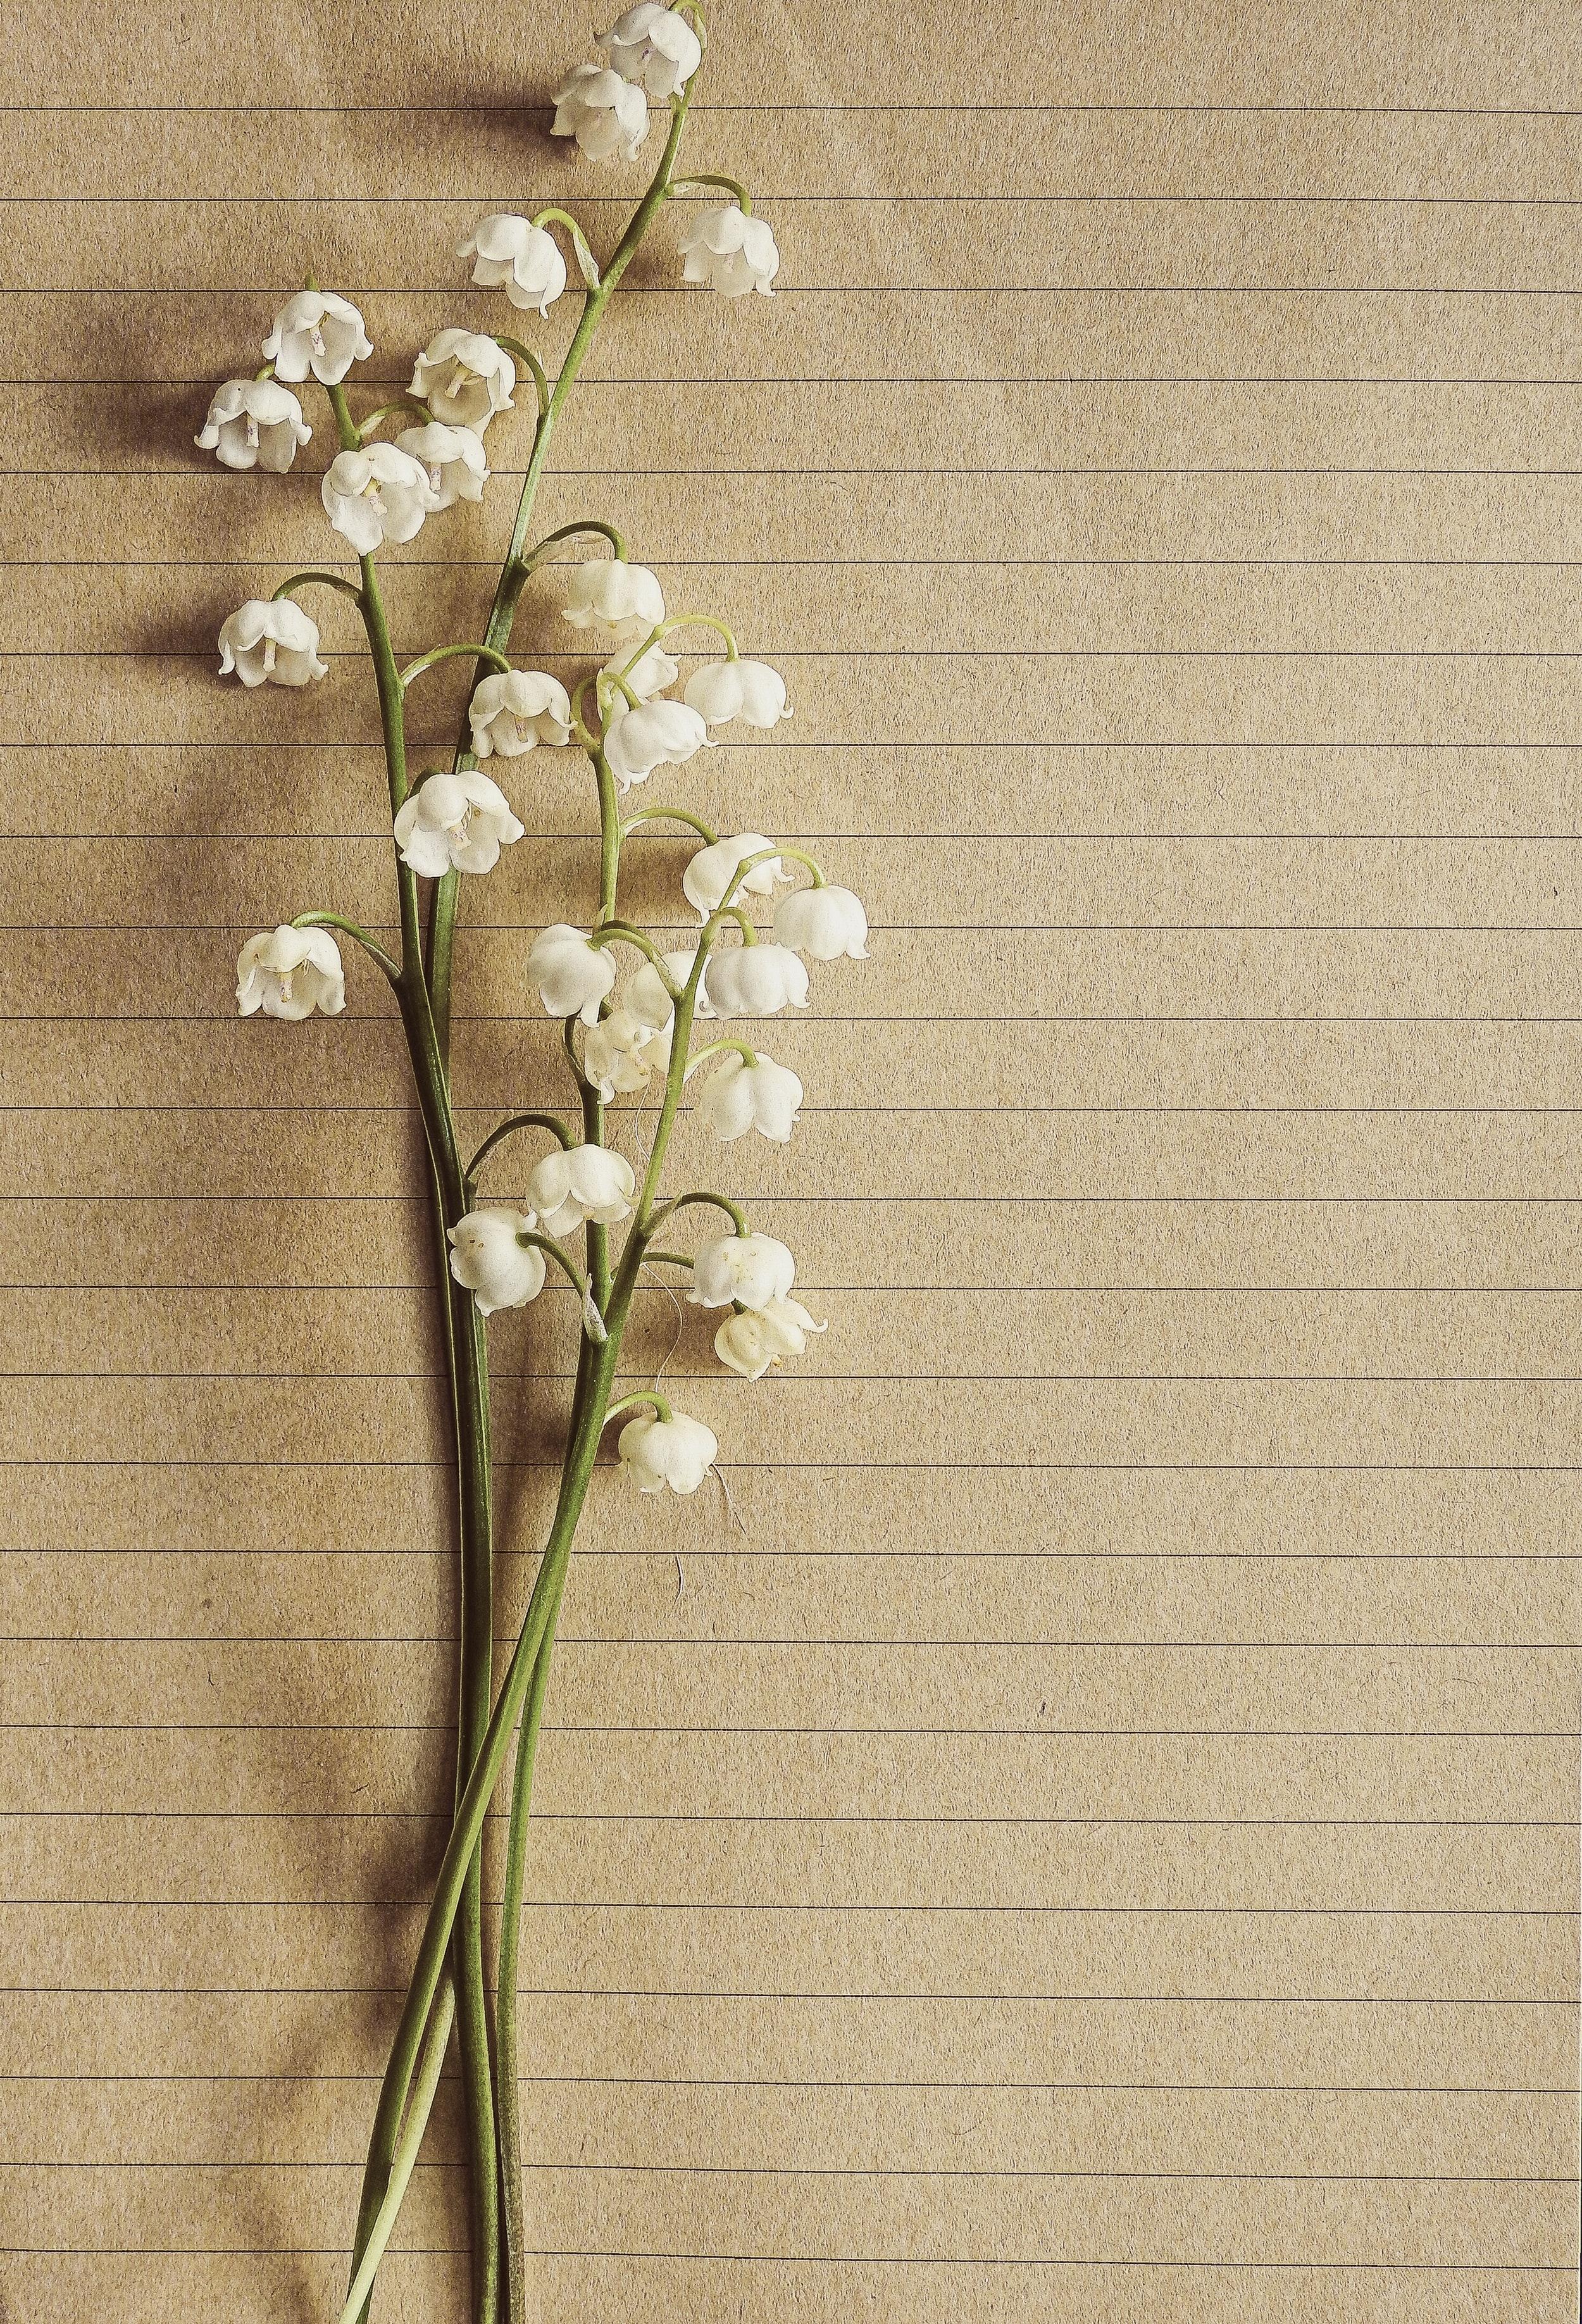 White Petaled Flower On Brown Trunks 183 Free Stock Photo